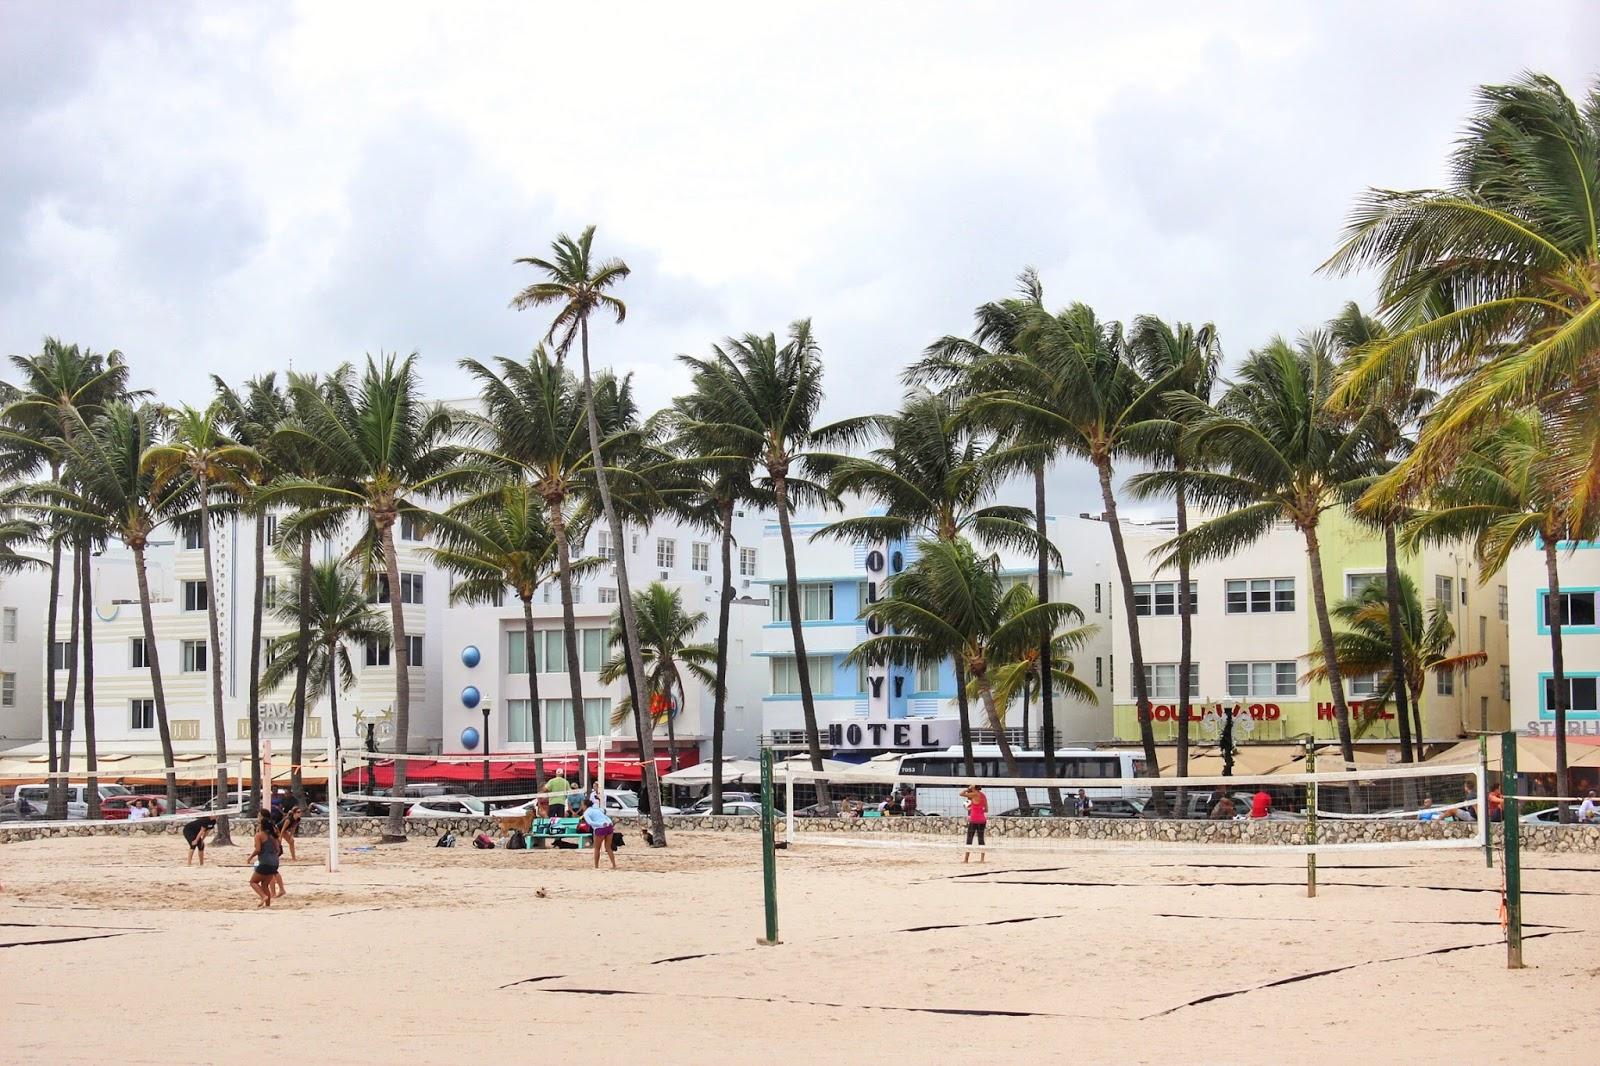 lifesthayle-miami-photodiary-south-beach-boulevard.jpg